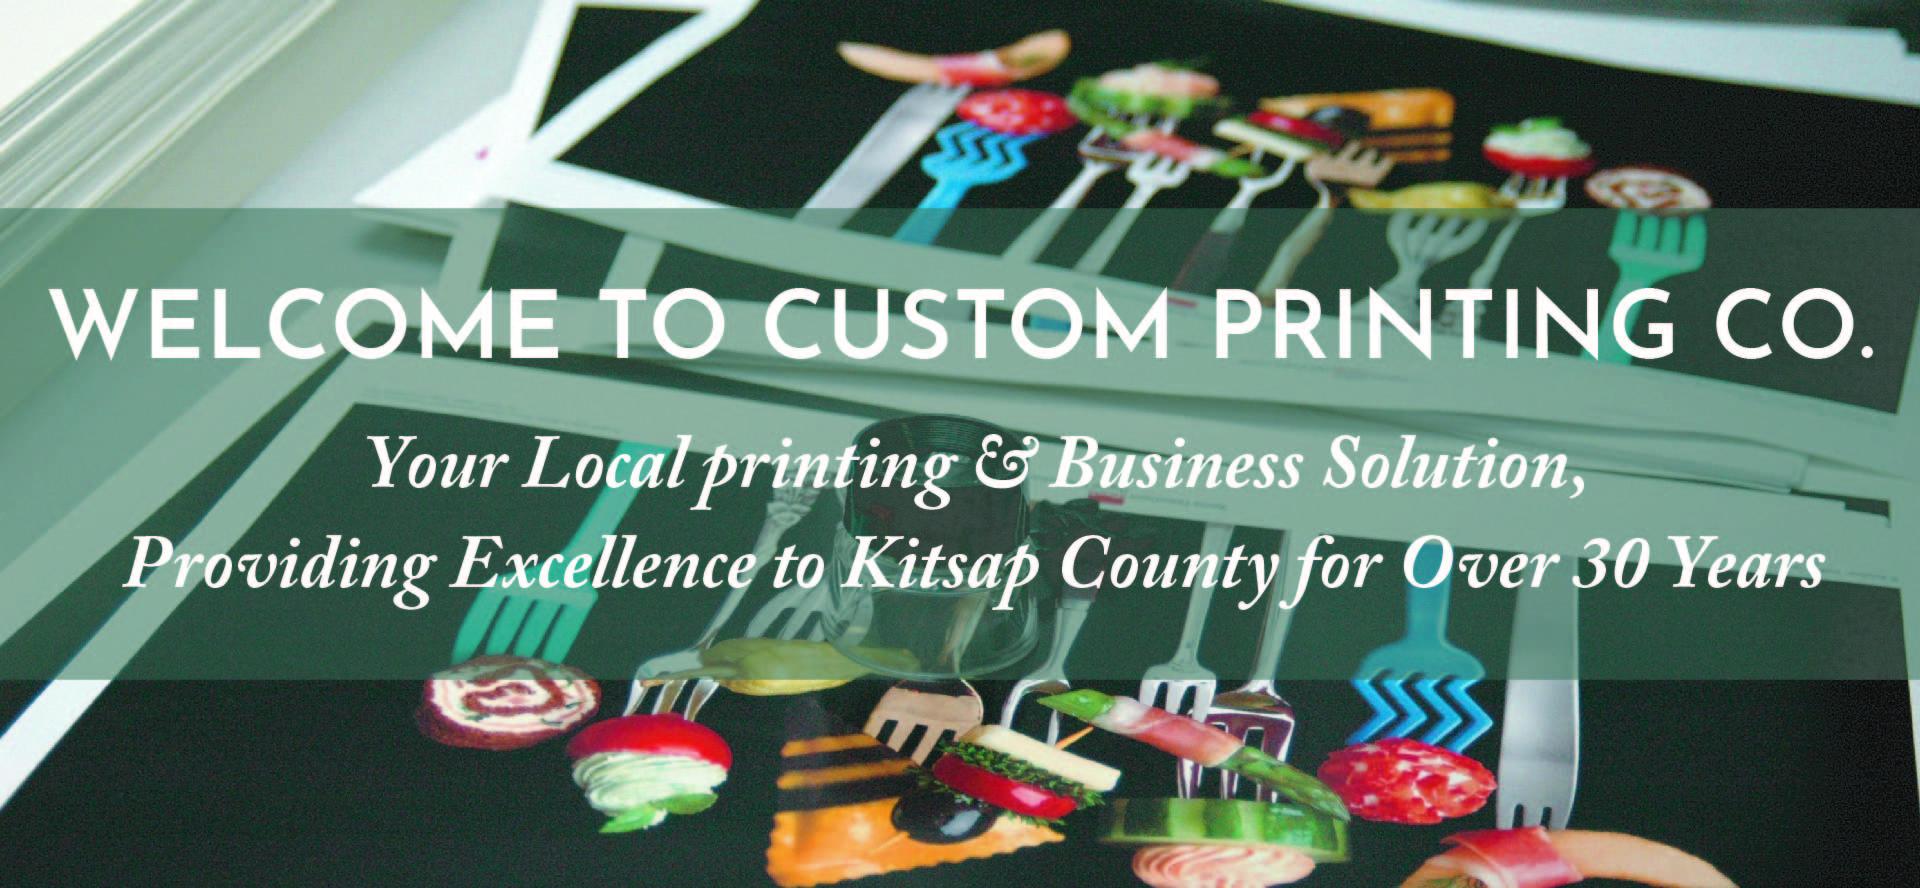 Welcome To Custom Printing